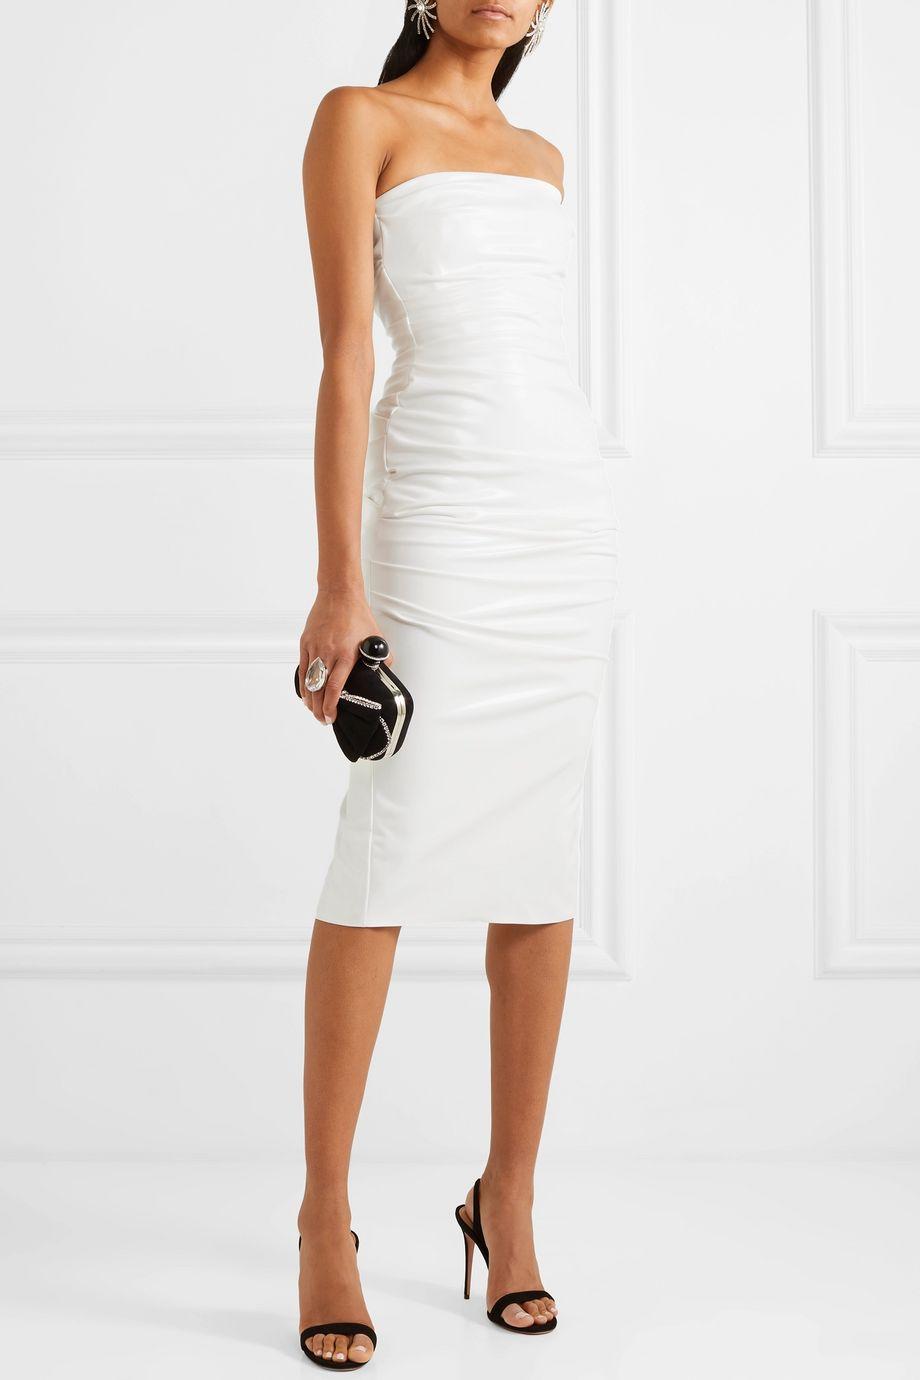 Alex Perry Decon strapless ruched stretch-vinyl dress